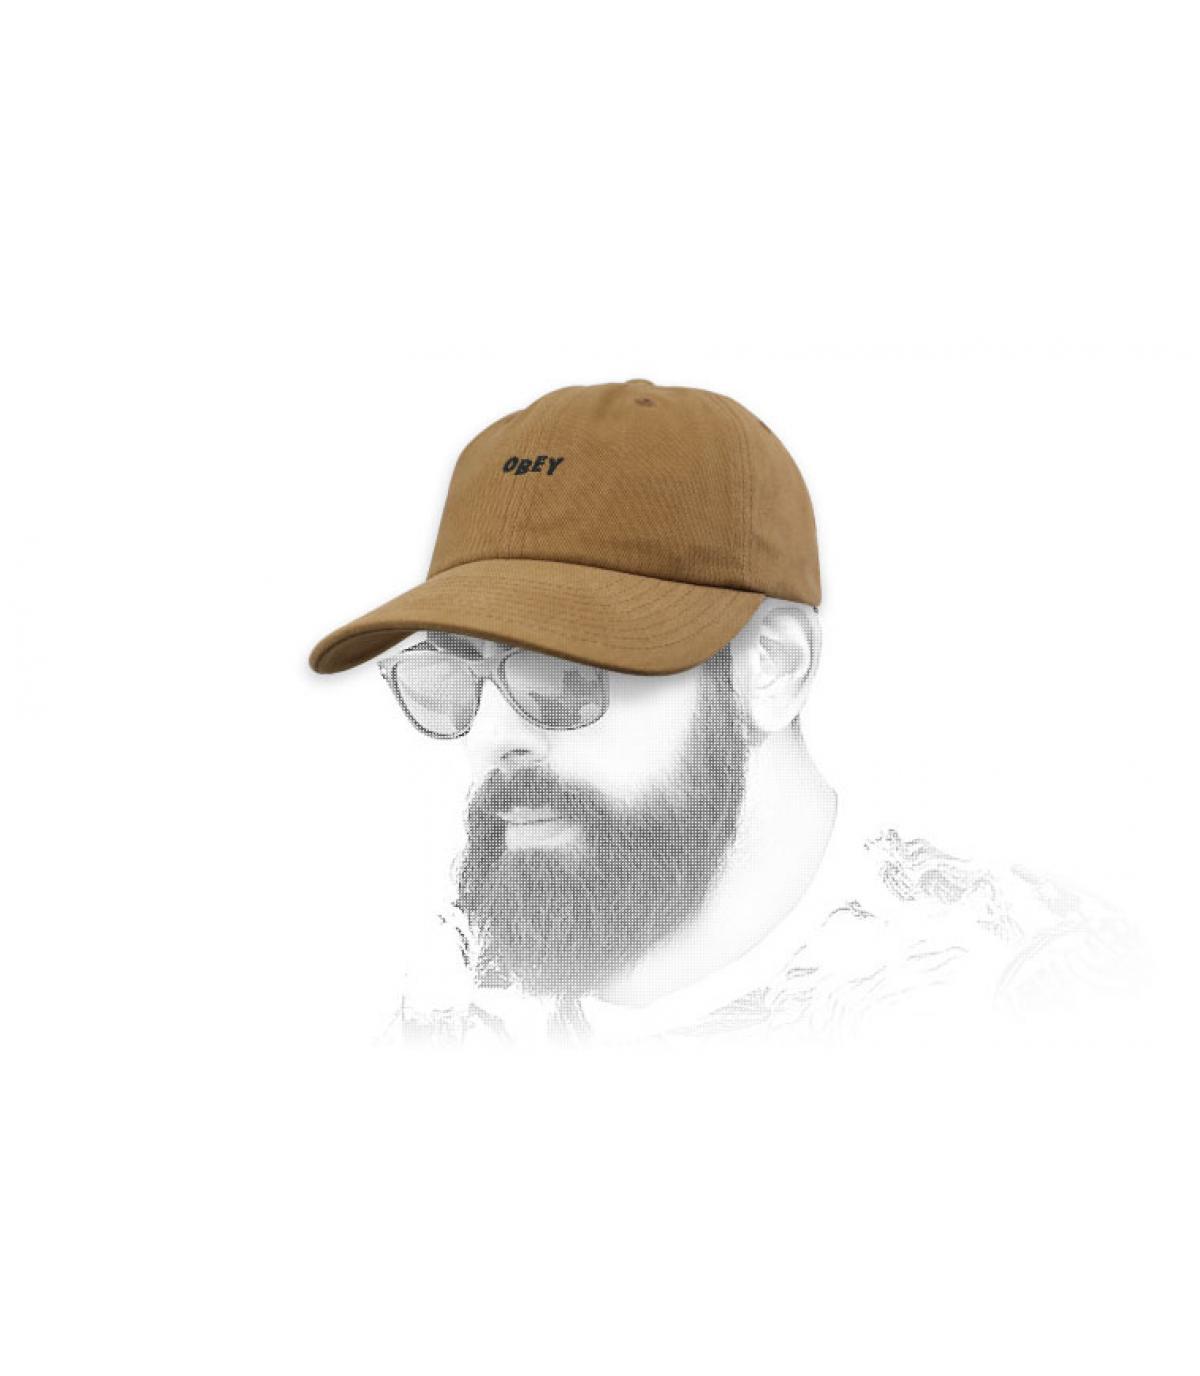 gorra curva Obey marrón